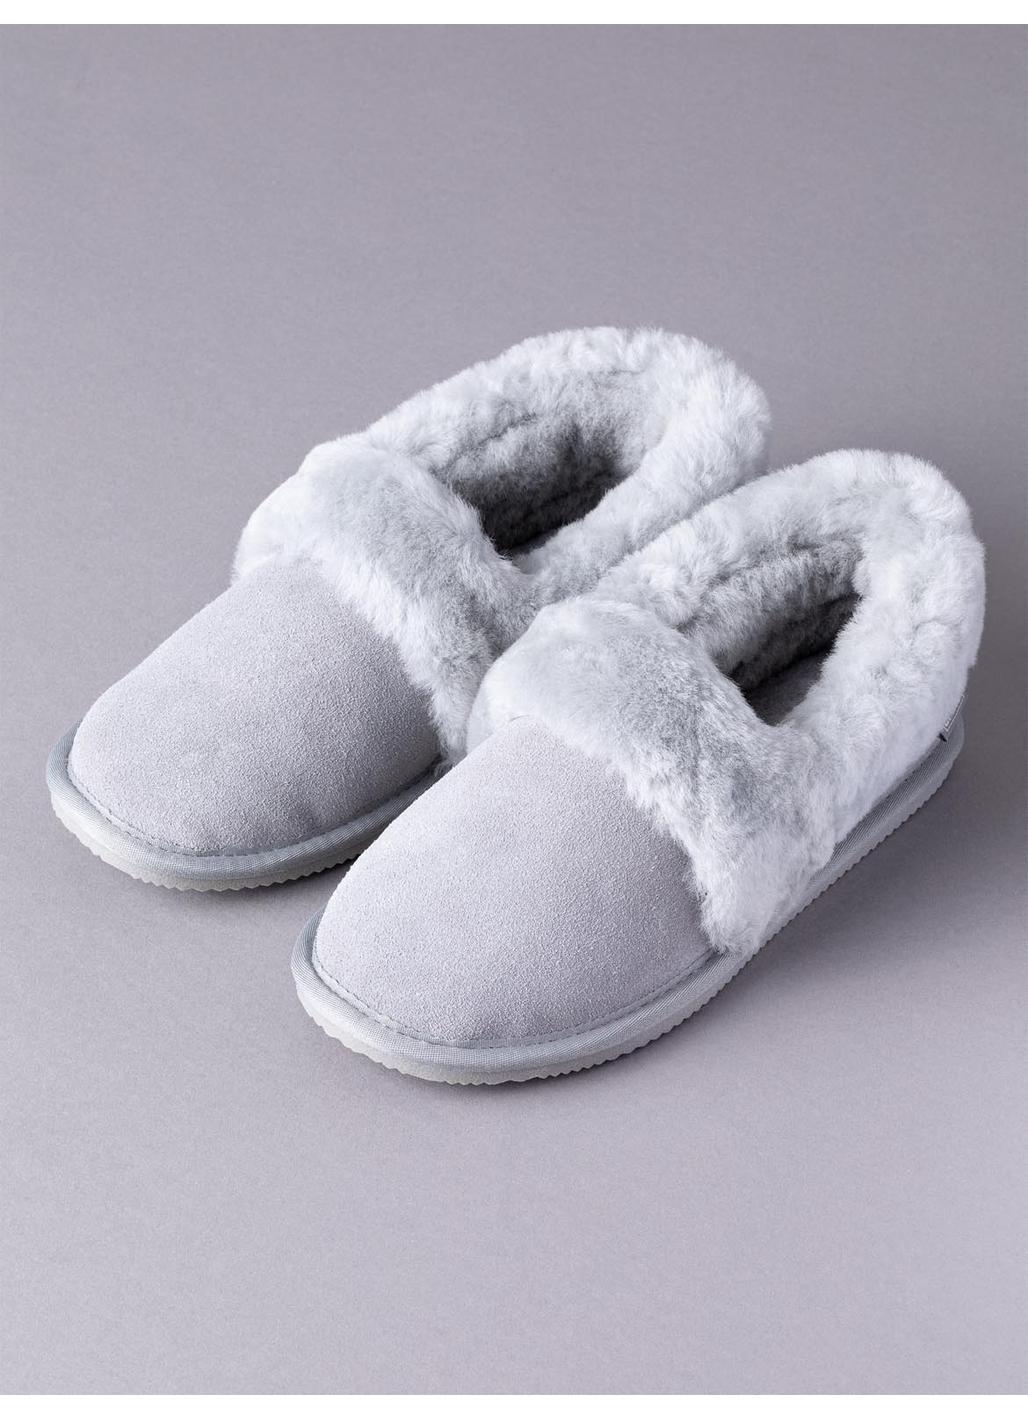 Ladies' Sheepskin Cuff Slippers in Light Grey